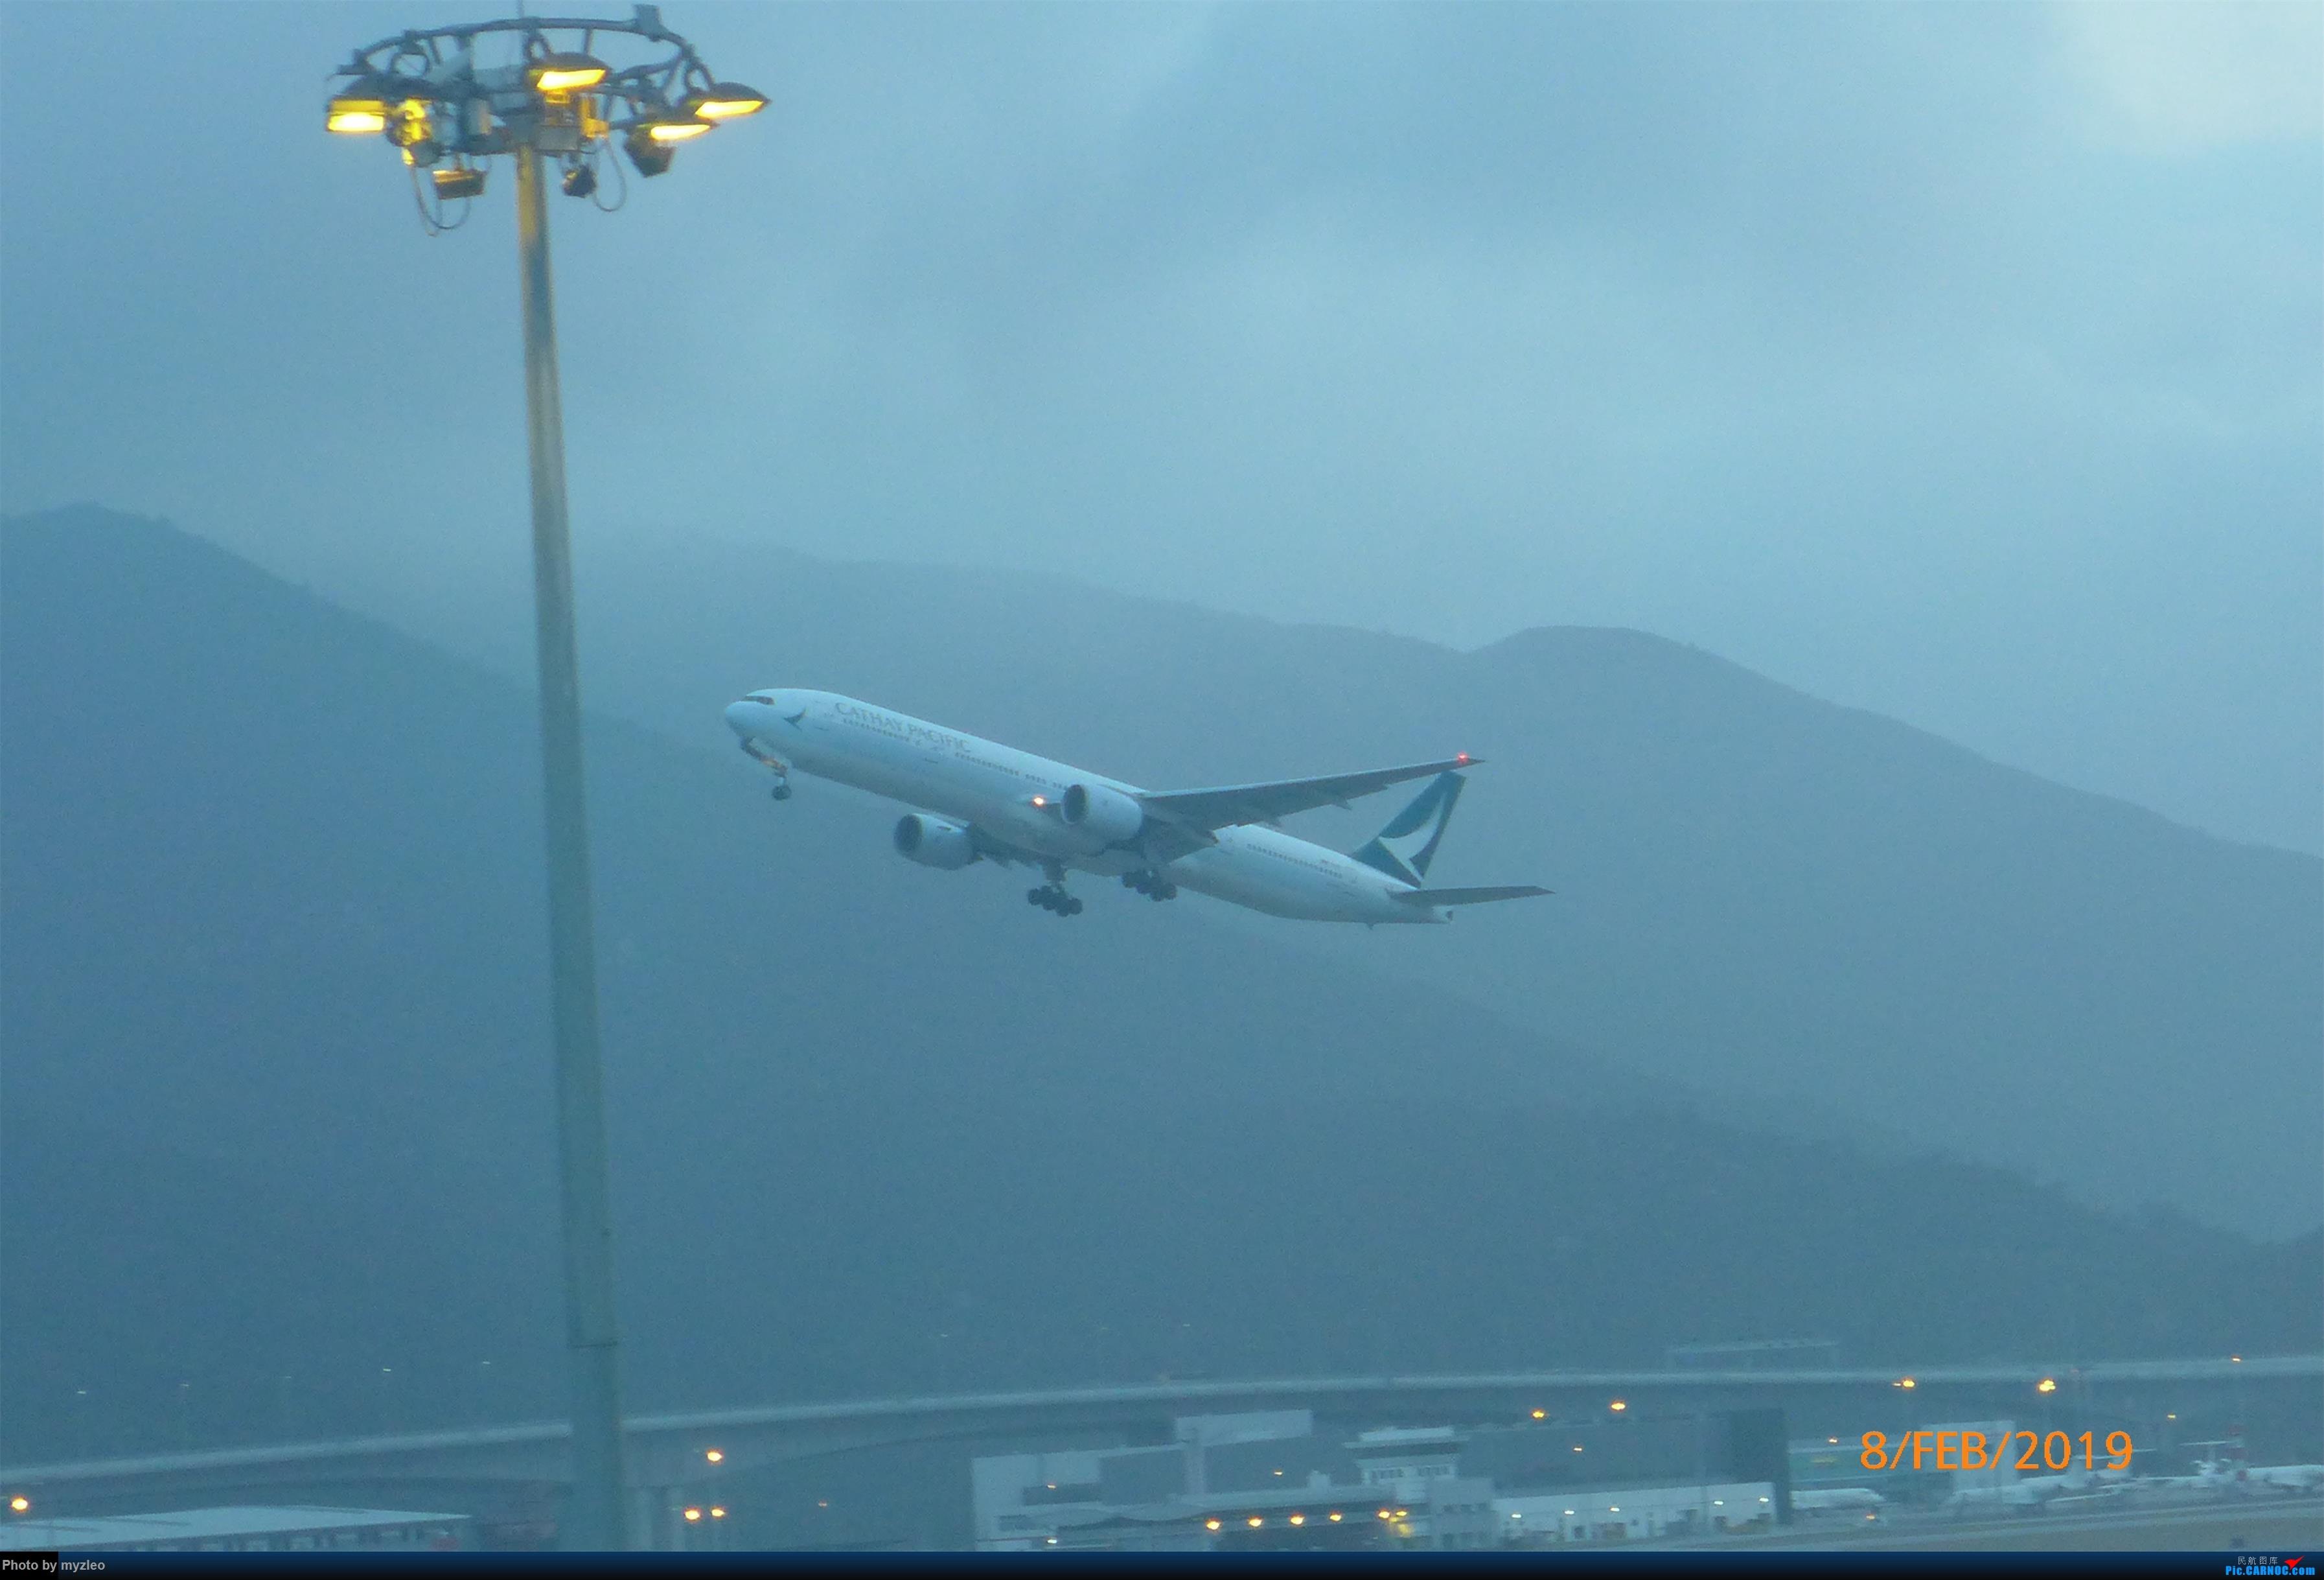 Re:[原创]【myzleo的游记4.5】十年之约(5)在香港的最后一天,搭乘港航333回沪 BOEING 777-300 B-HNF 中国香港国际机场